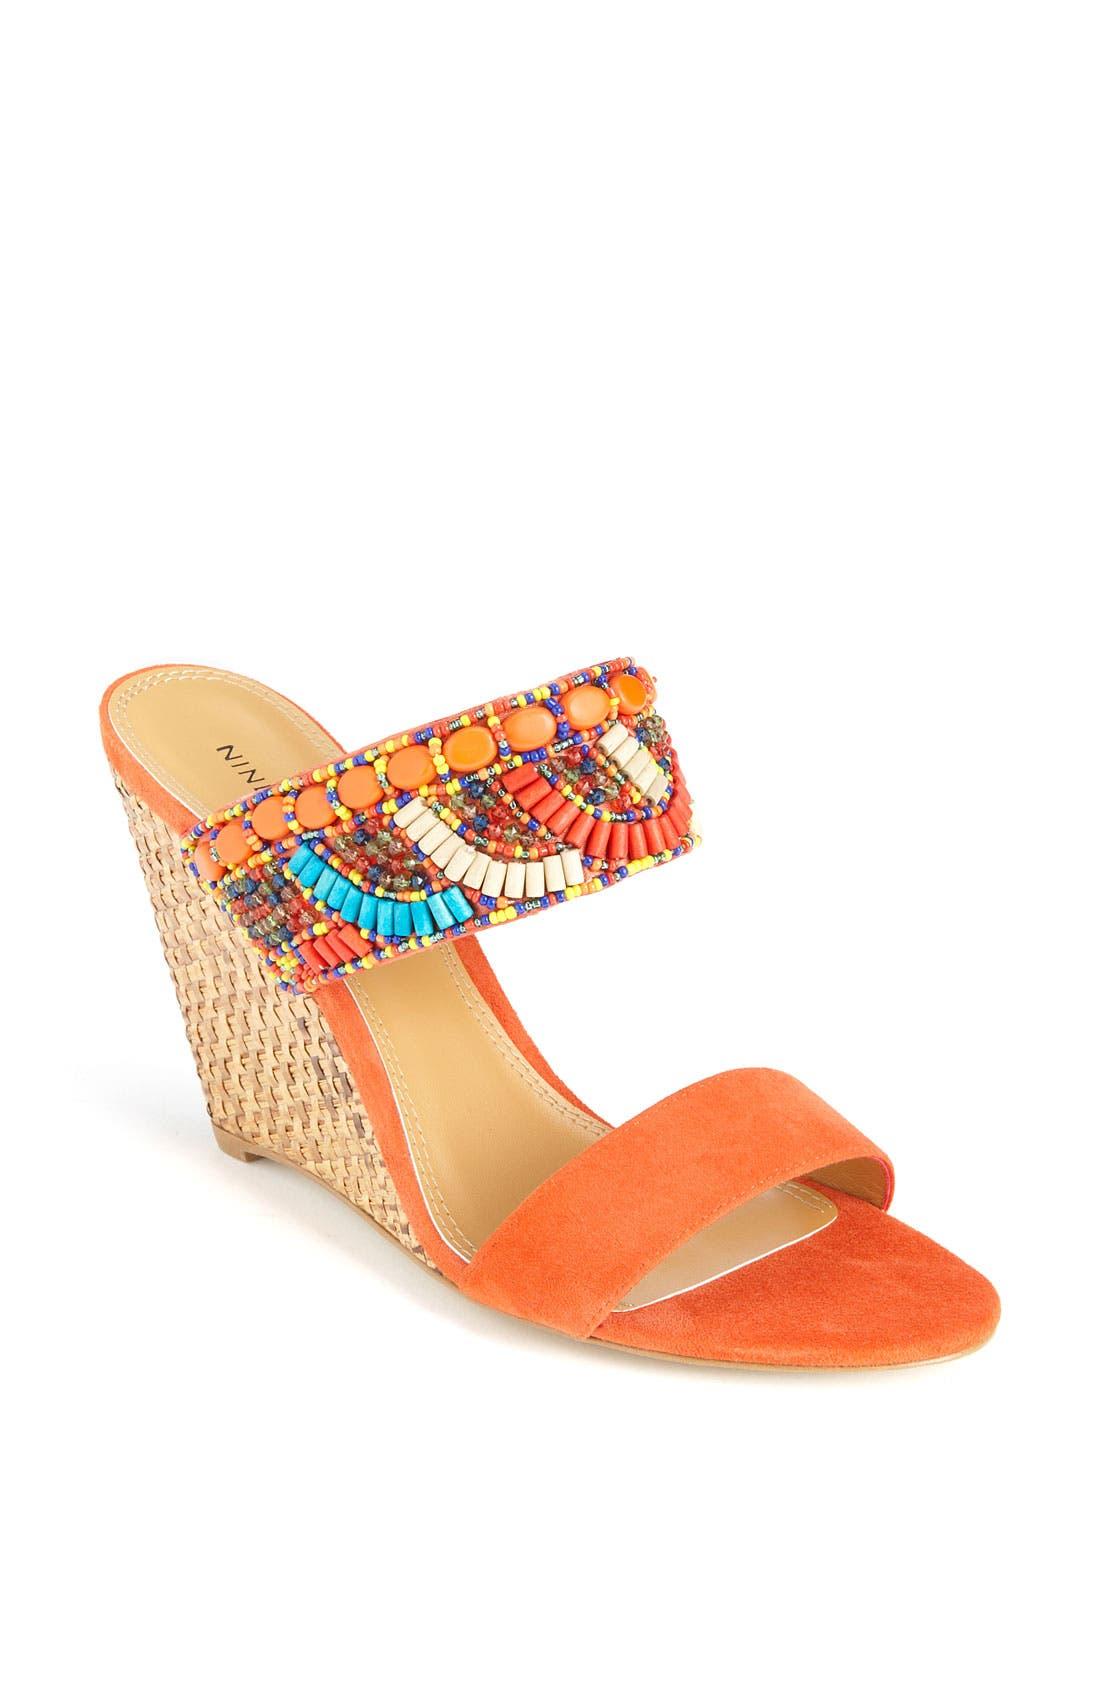 Alternate Image 1 Selected - Nine West 'Sweet Rosey' Sandal